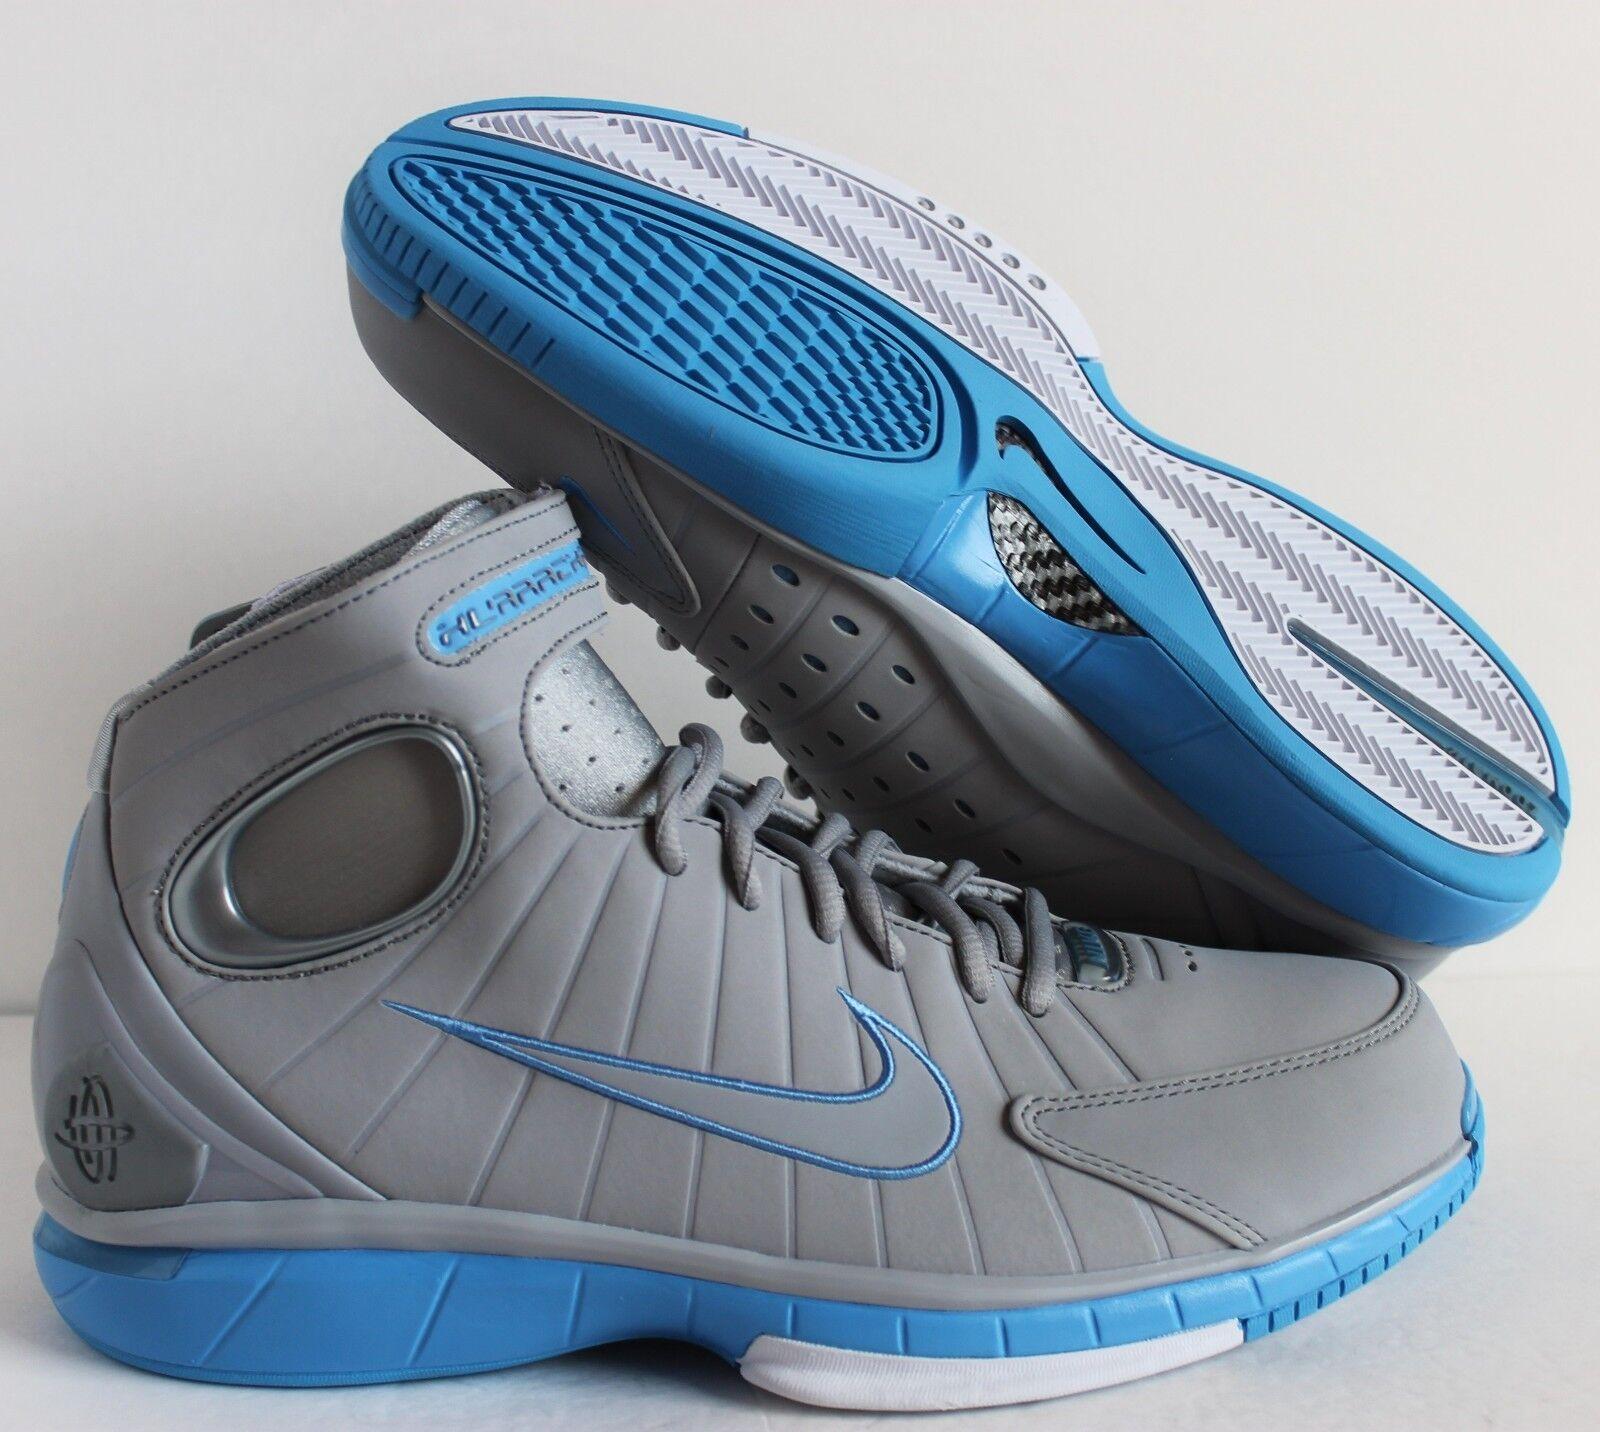 Nike kobe air zoom huarache 2k4 kobe Nike lupo grey-university blu sz 11 [308475-002] 342d30